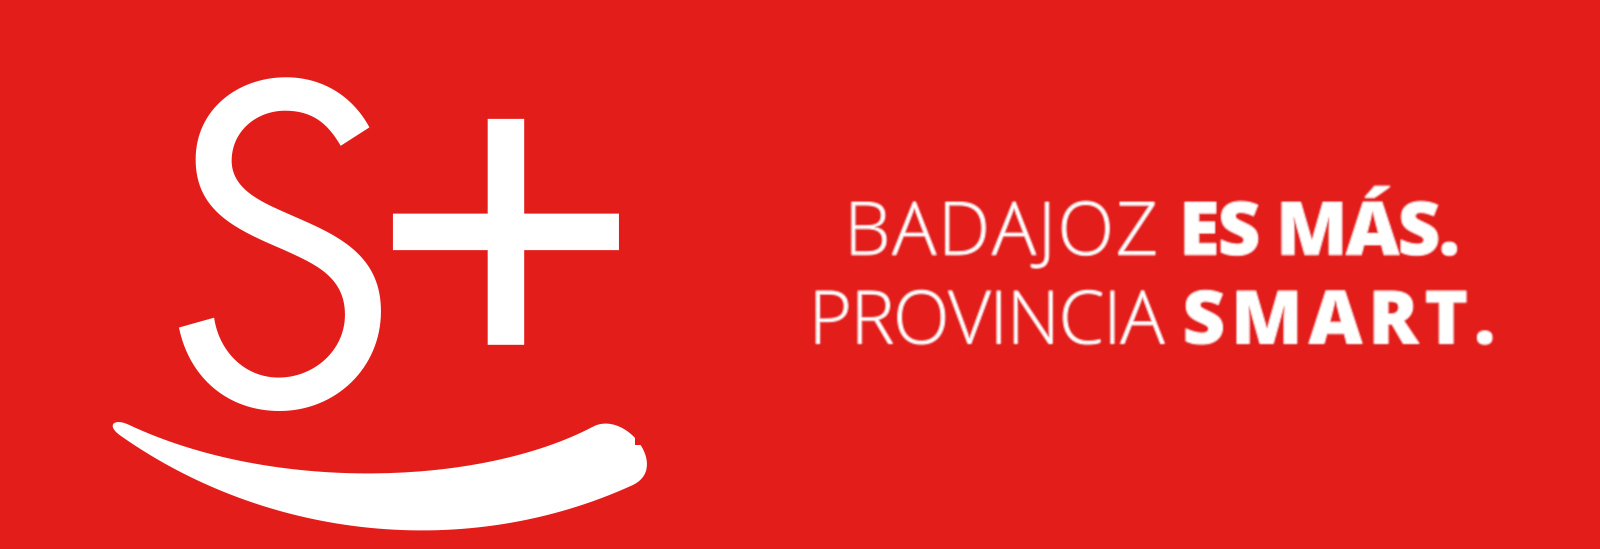 Badajoz es mas